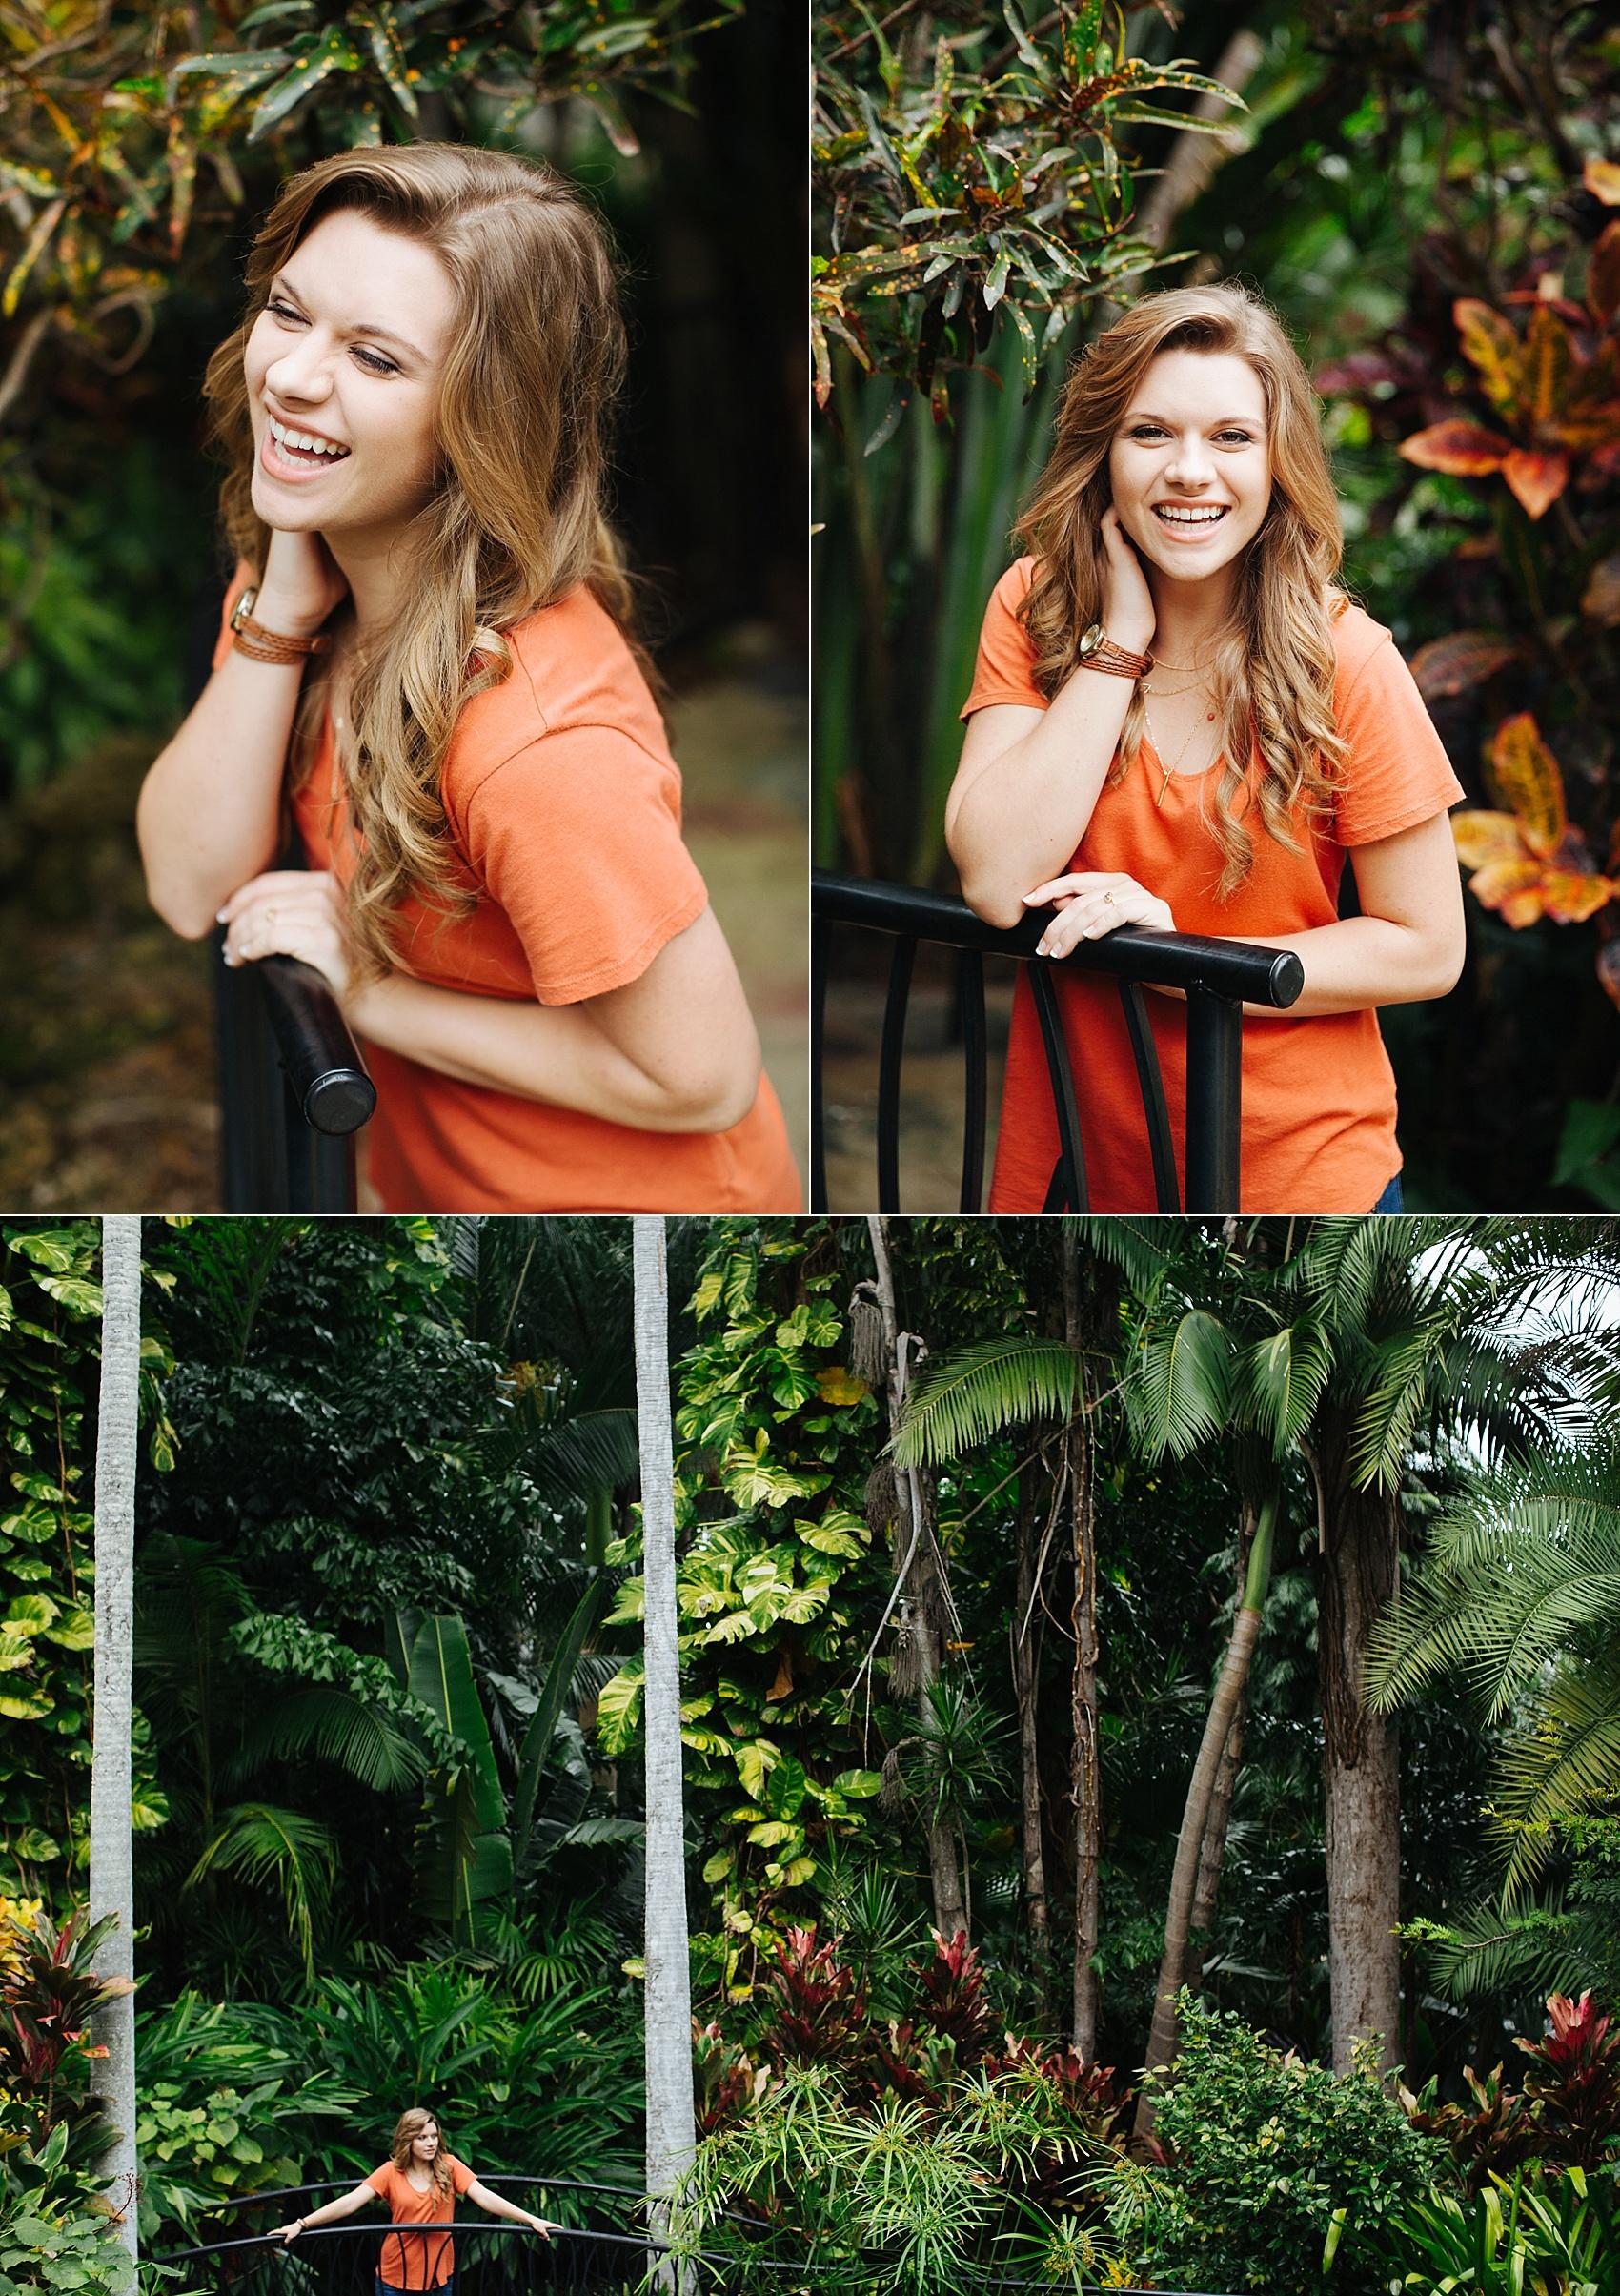 stpete senior portraits sunken gardens leah-9